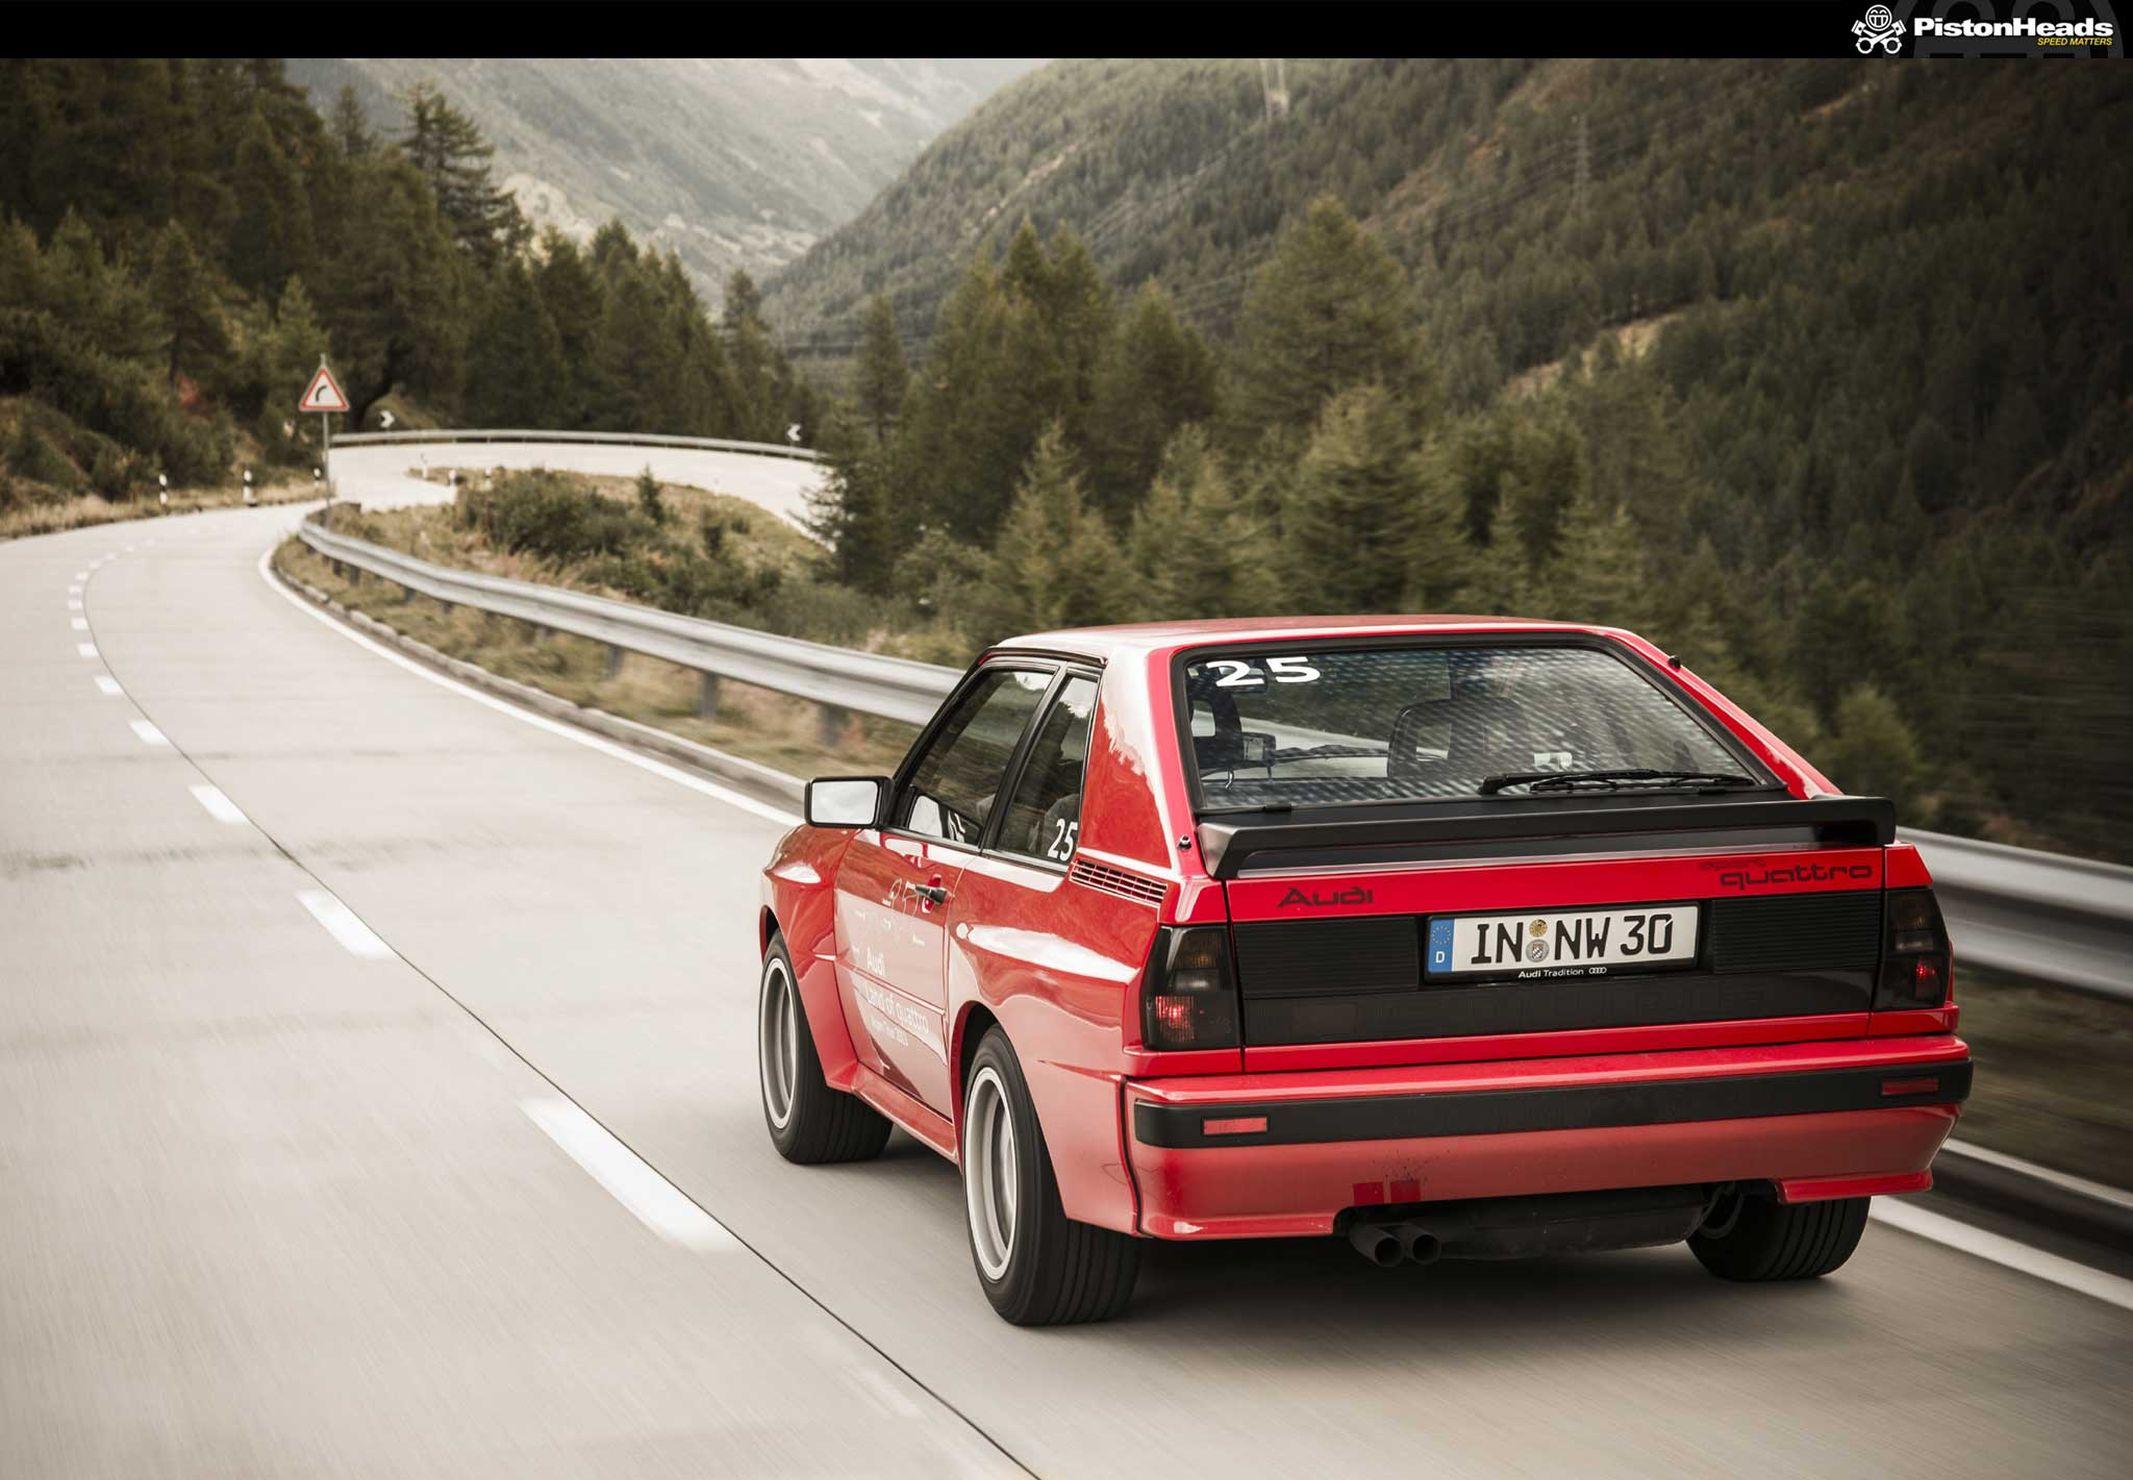 Audi Sport Quattro Wallpapers - Audi Sport Quattro , HD Wallpaper & Backgrounds